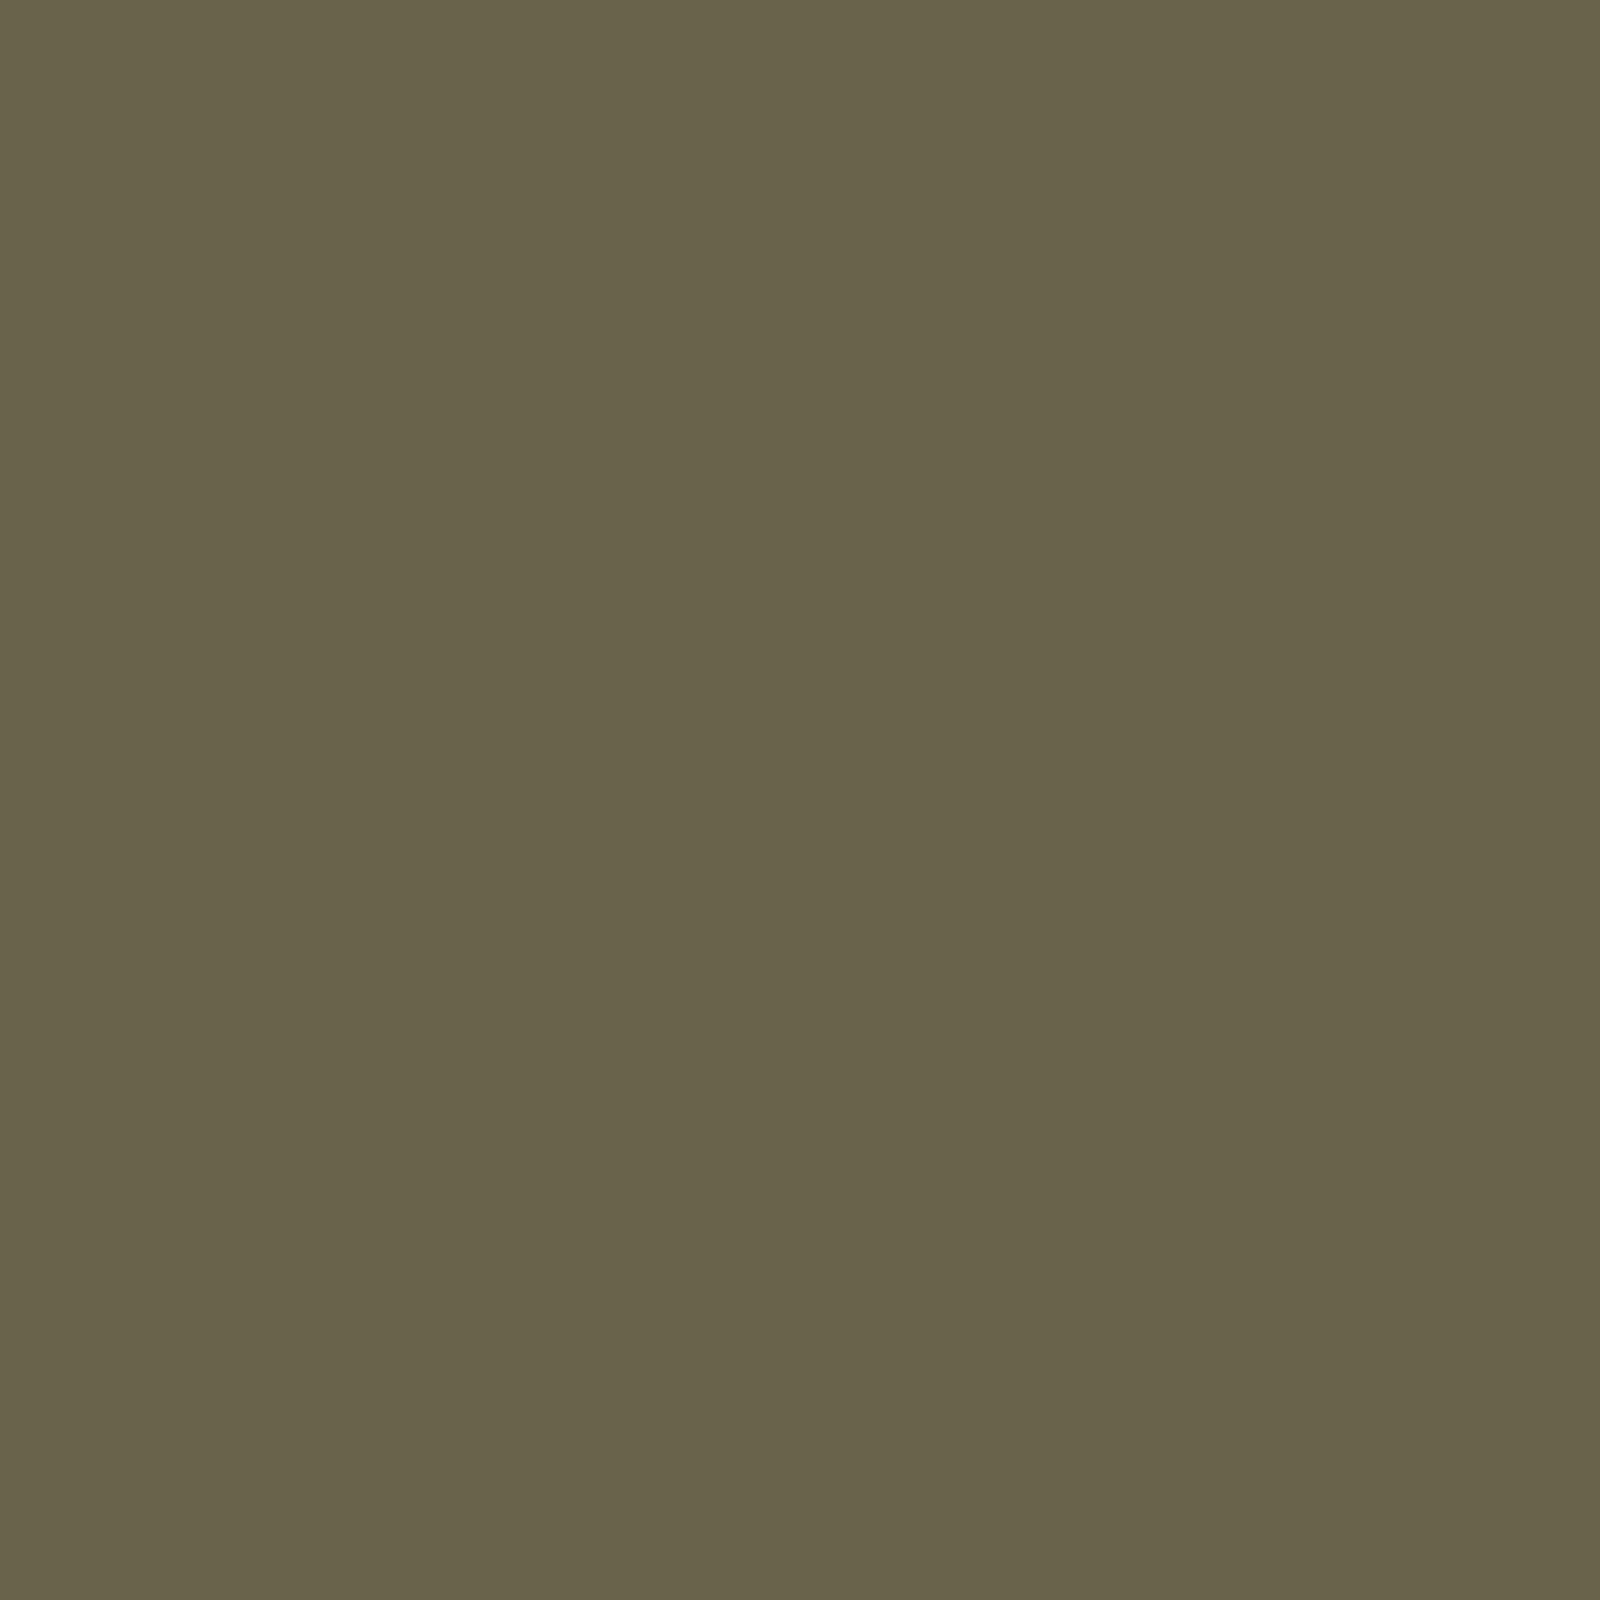 US Army Olive Drab ANA 319